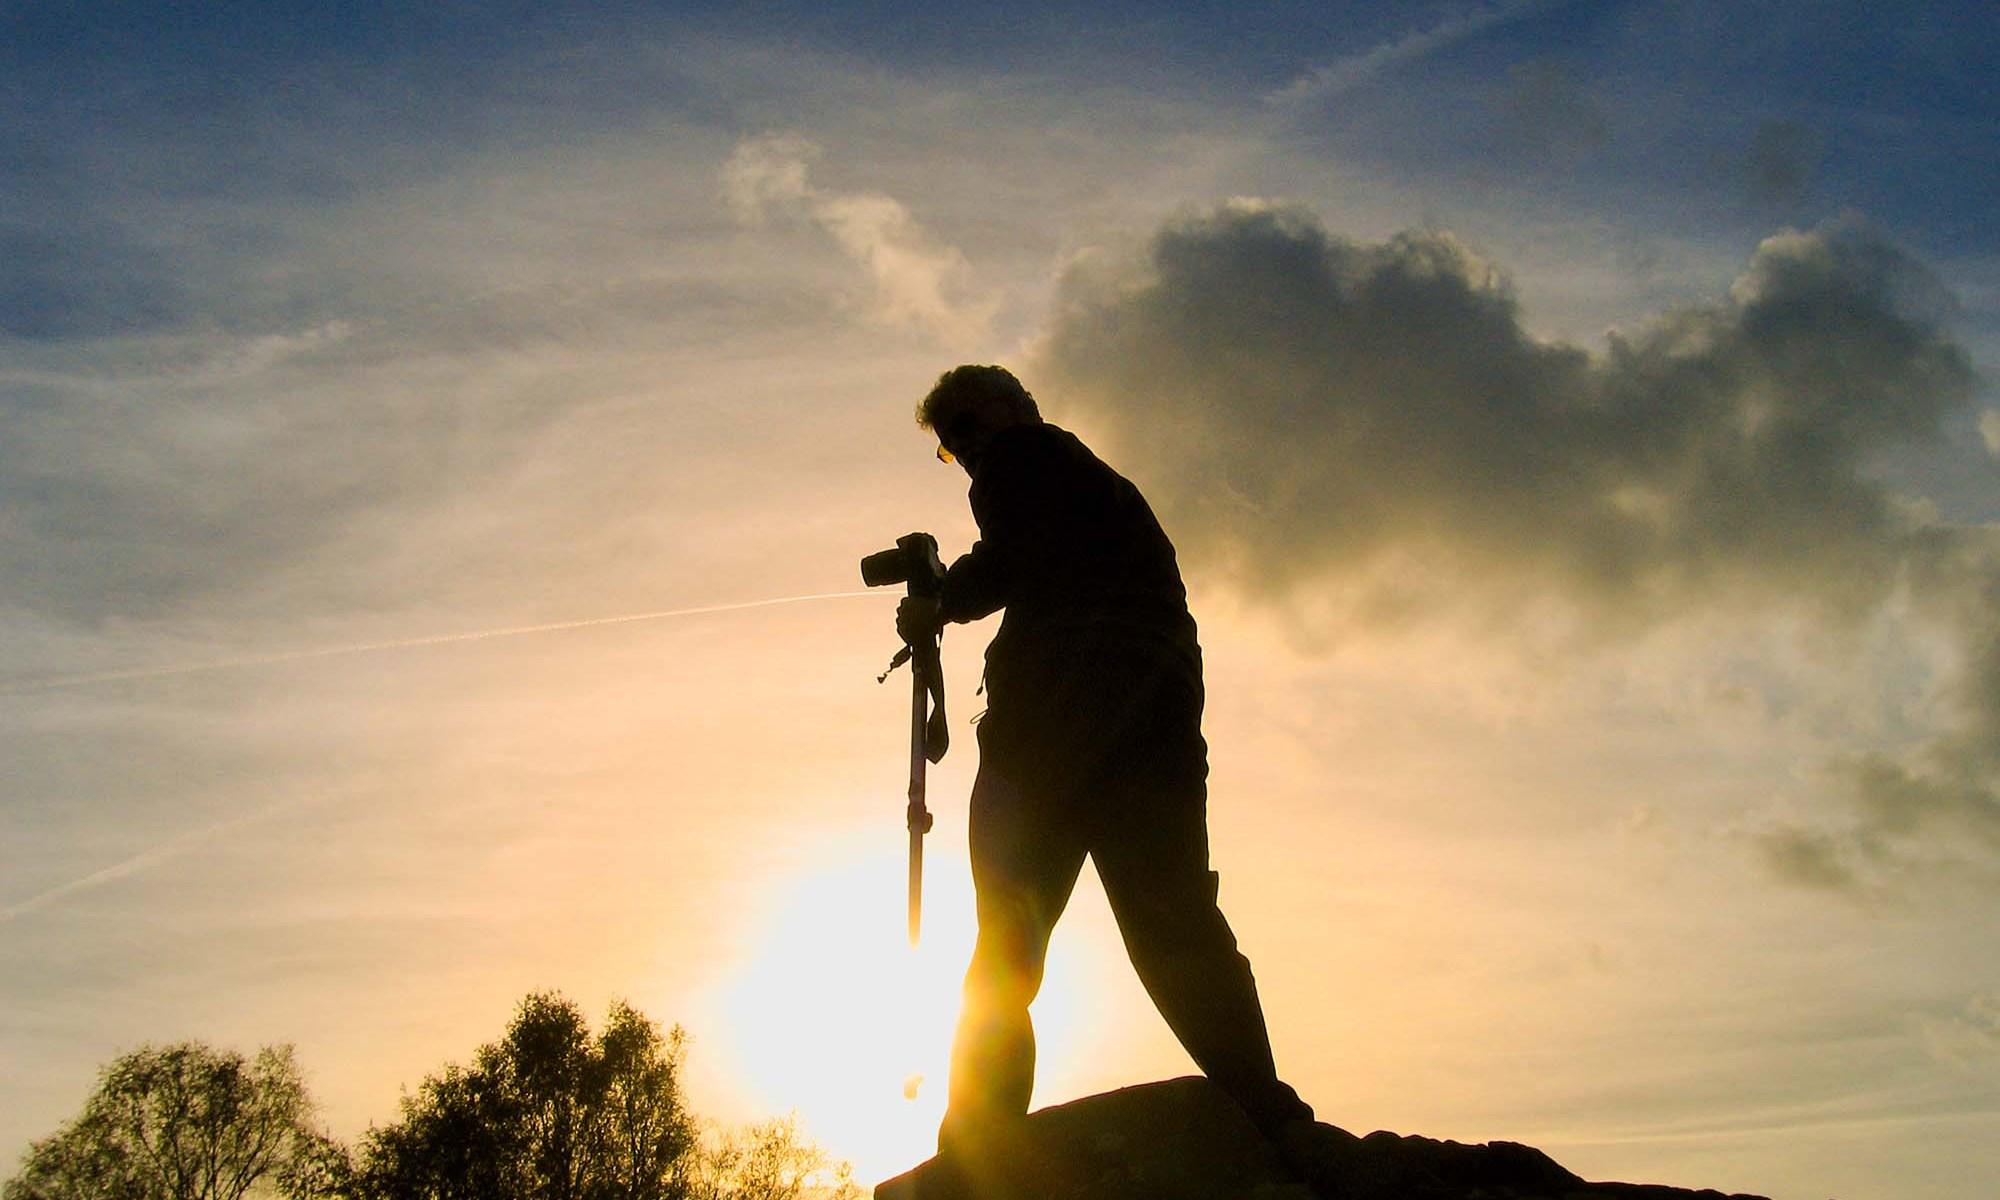 The Photographer's Sunset